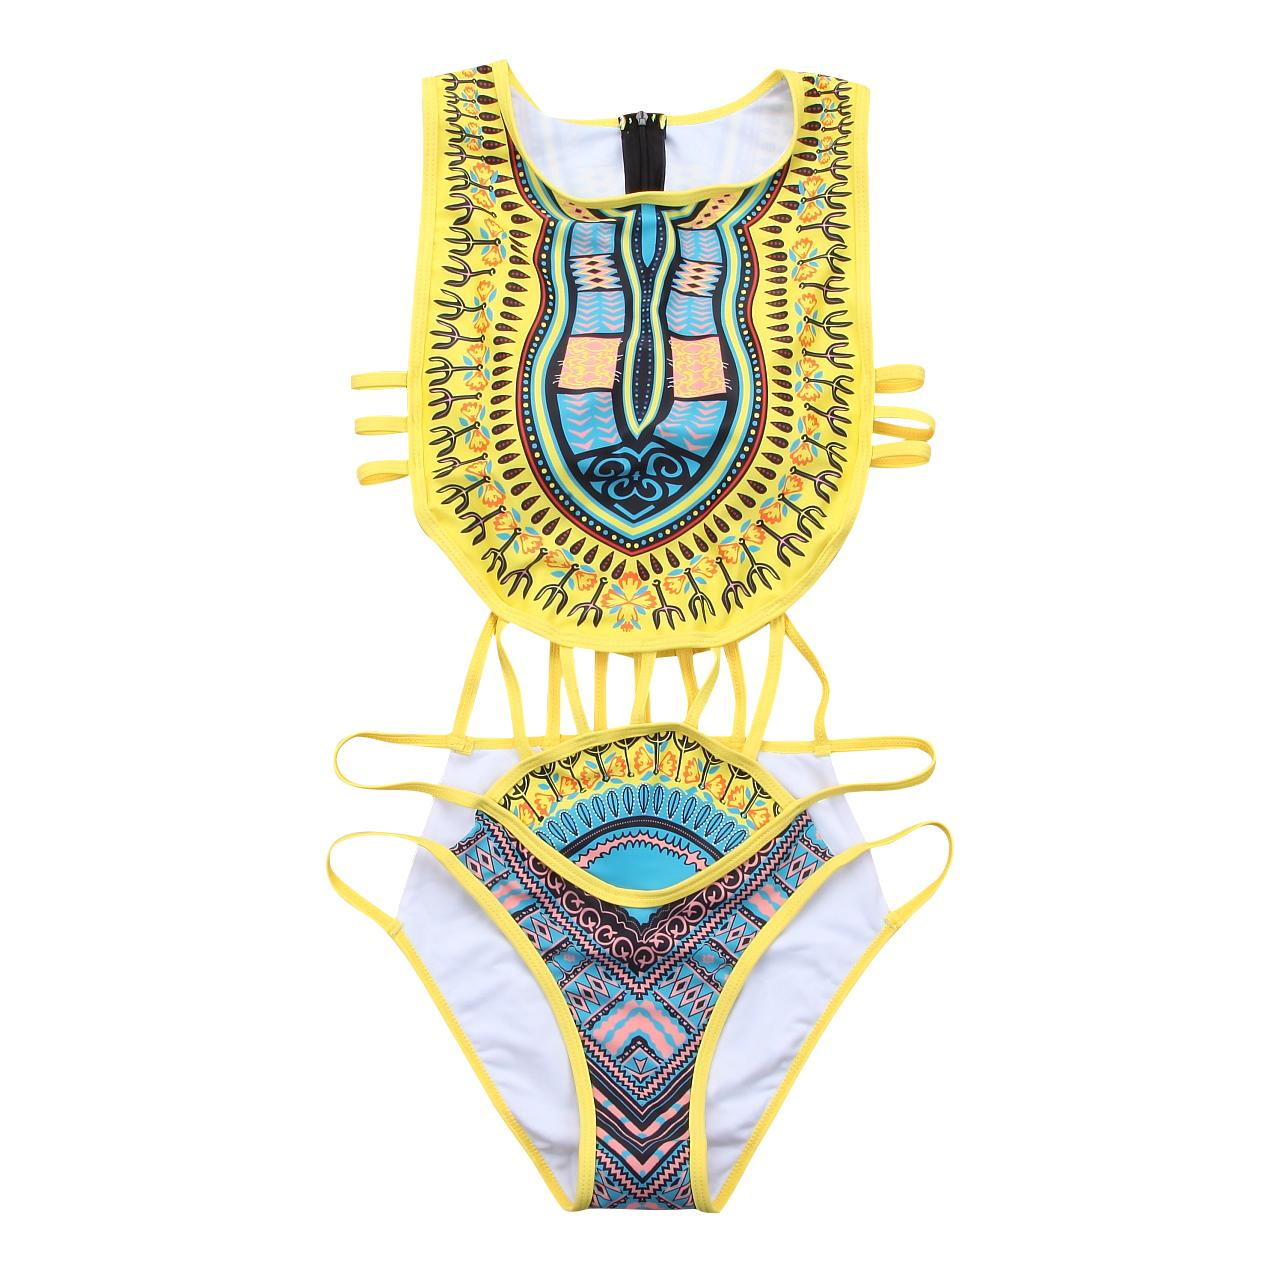 https://www.dhresource.com/0x0s/f2-albu-g10-M00-2E-A0-rBVaWVyIWHGAAuubAAu0rlxiZmk239.jpg/2019-mulheres-sexy-tnica-swimsuit-floral.jpg